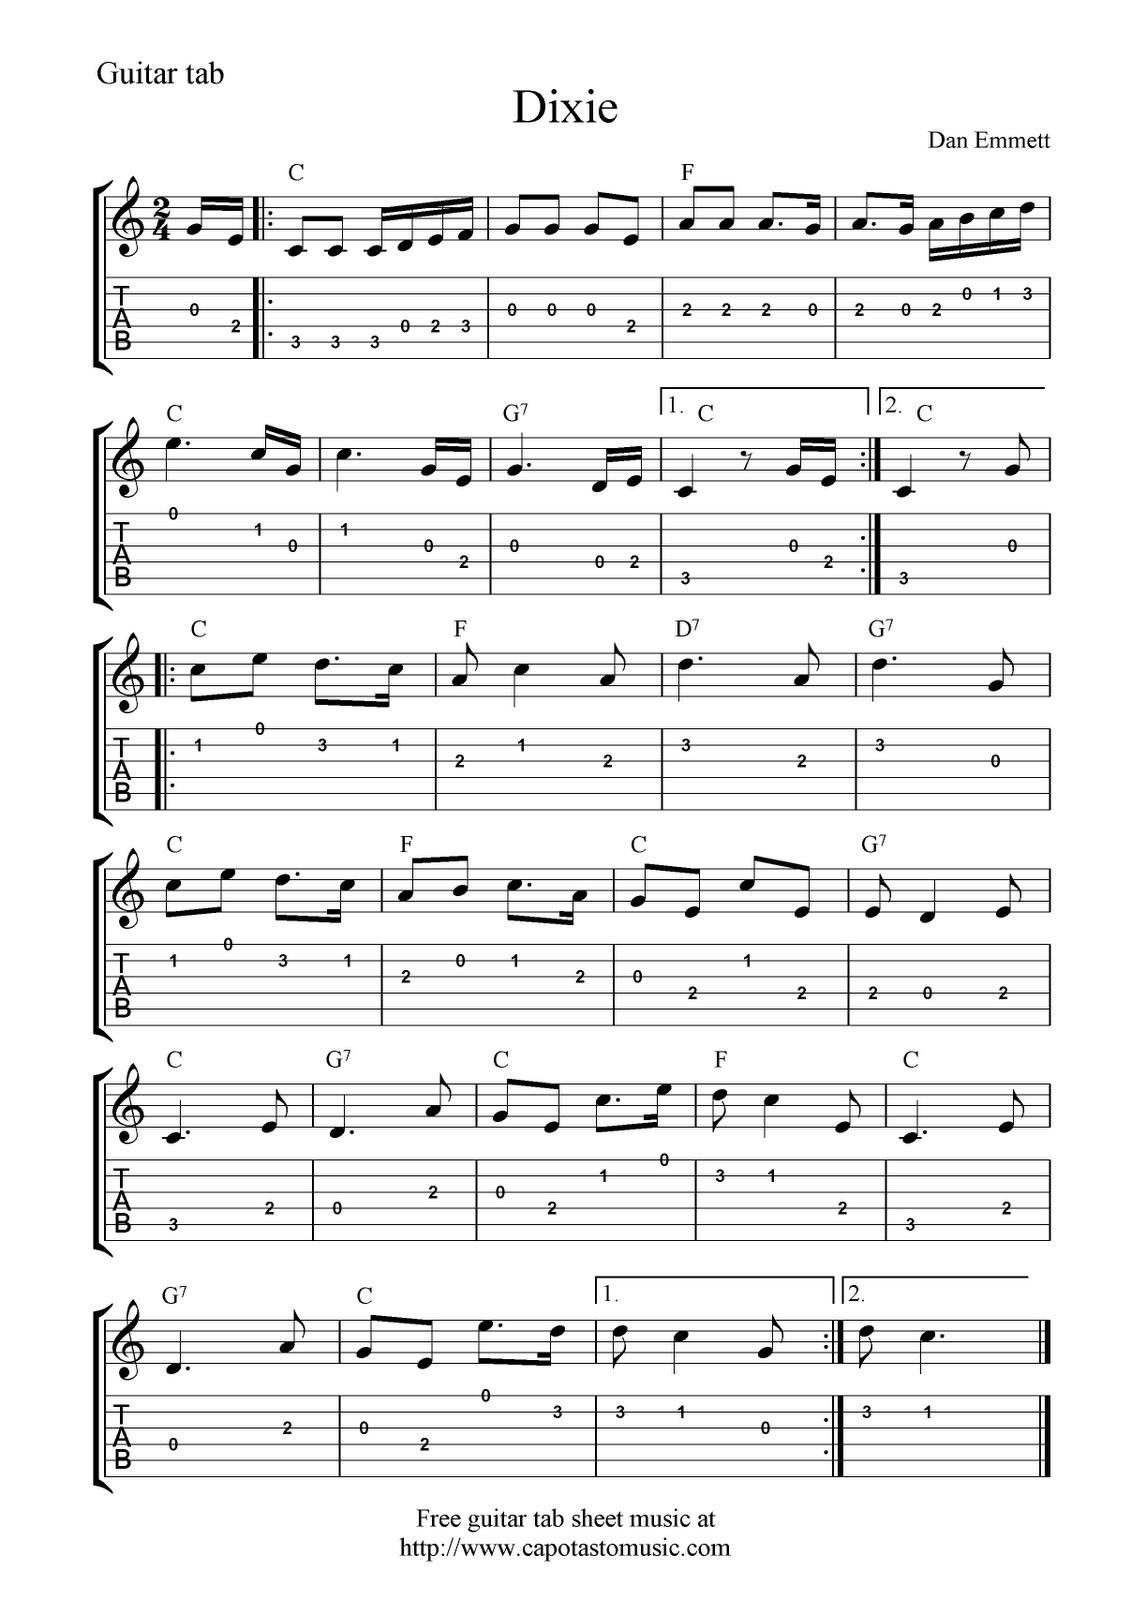 Guitar Music Sheets For Beginners | Free Guitar Tab Sheet Music - Free Printable Guitar Music